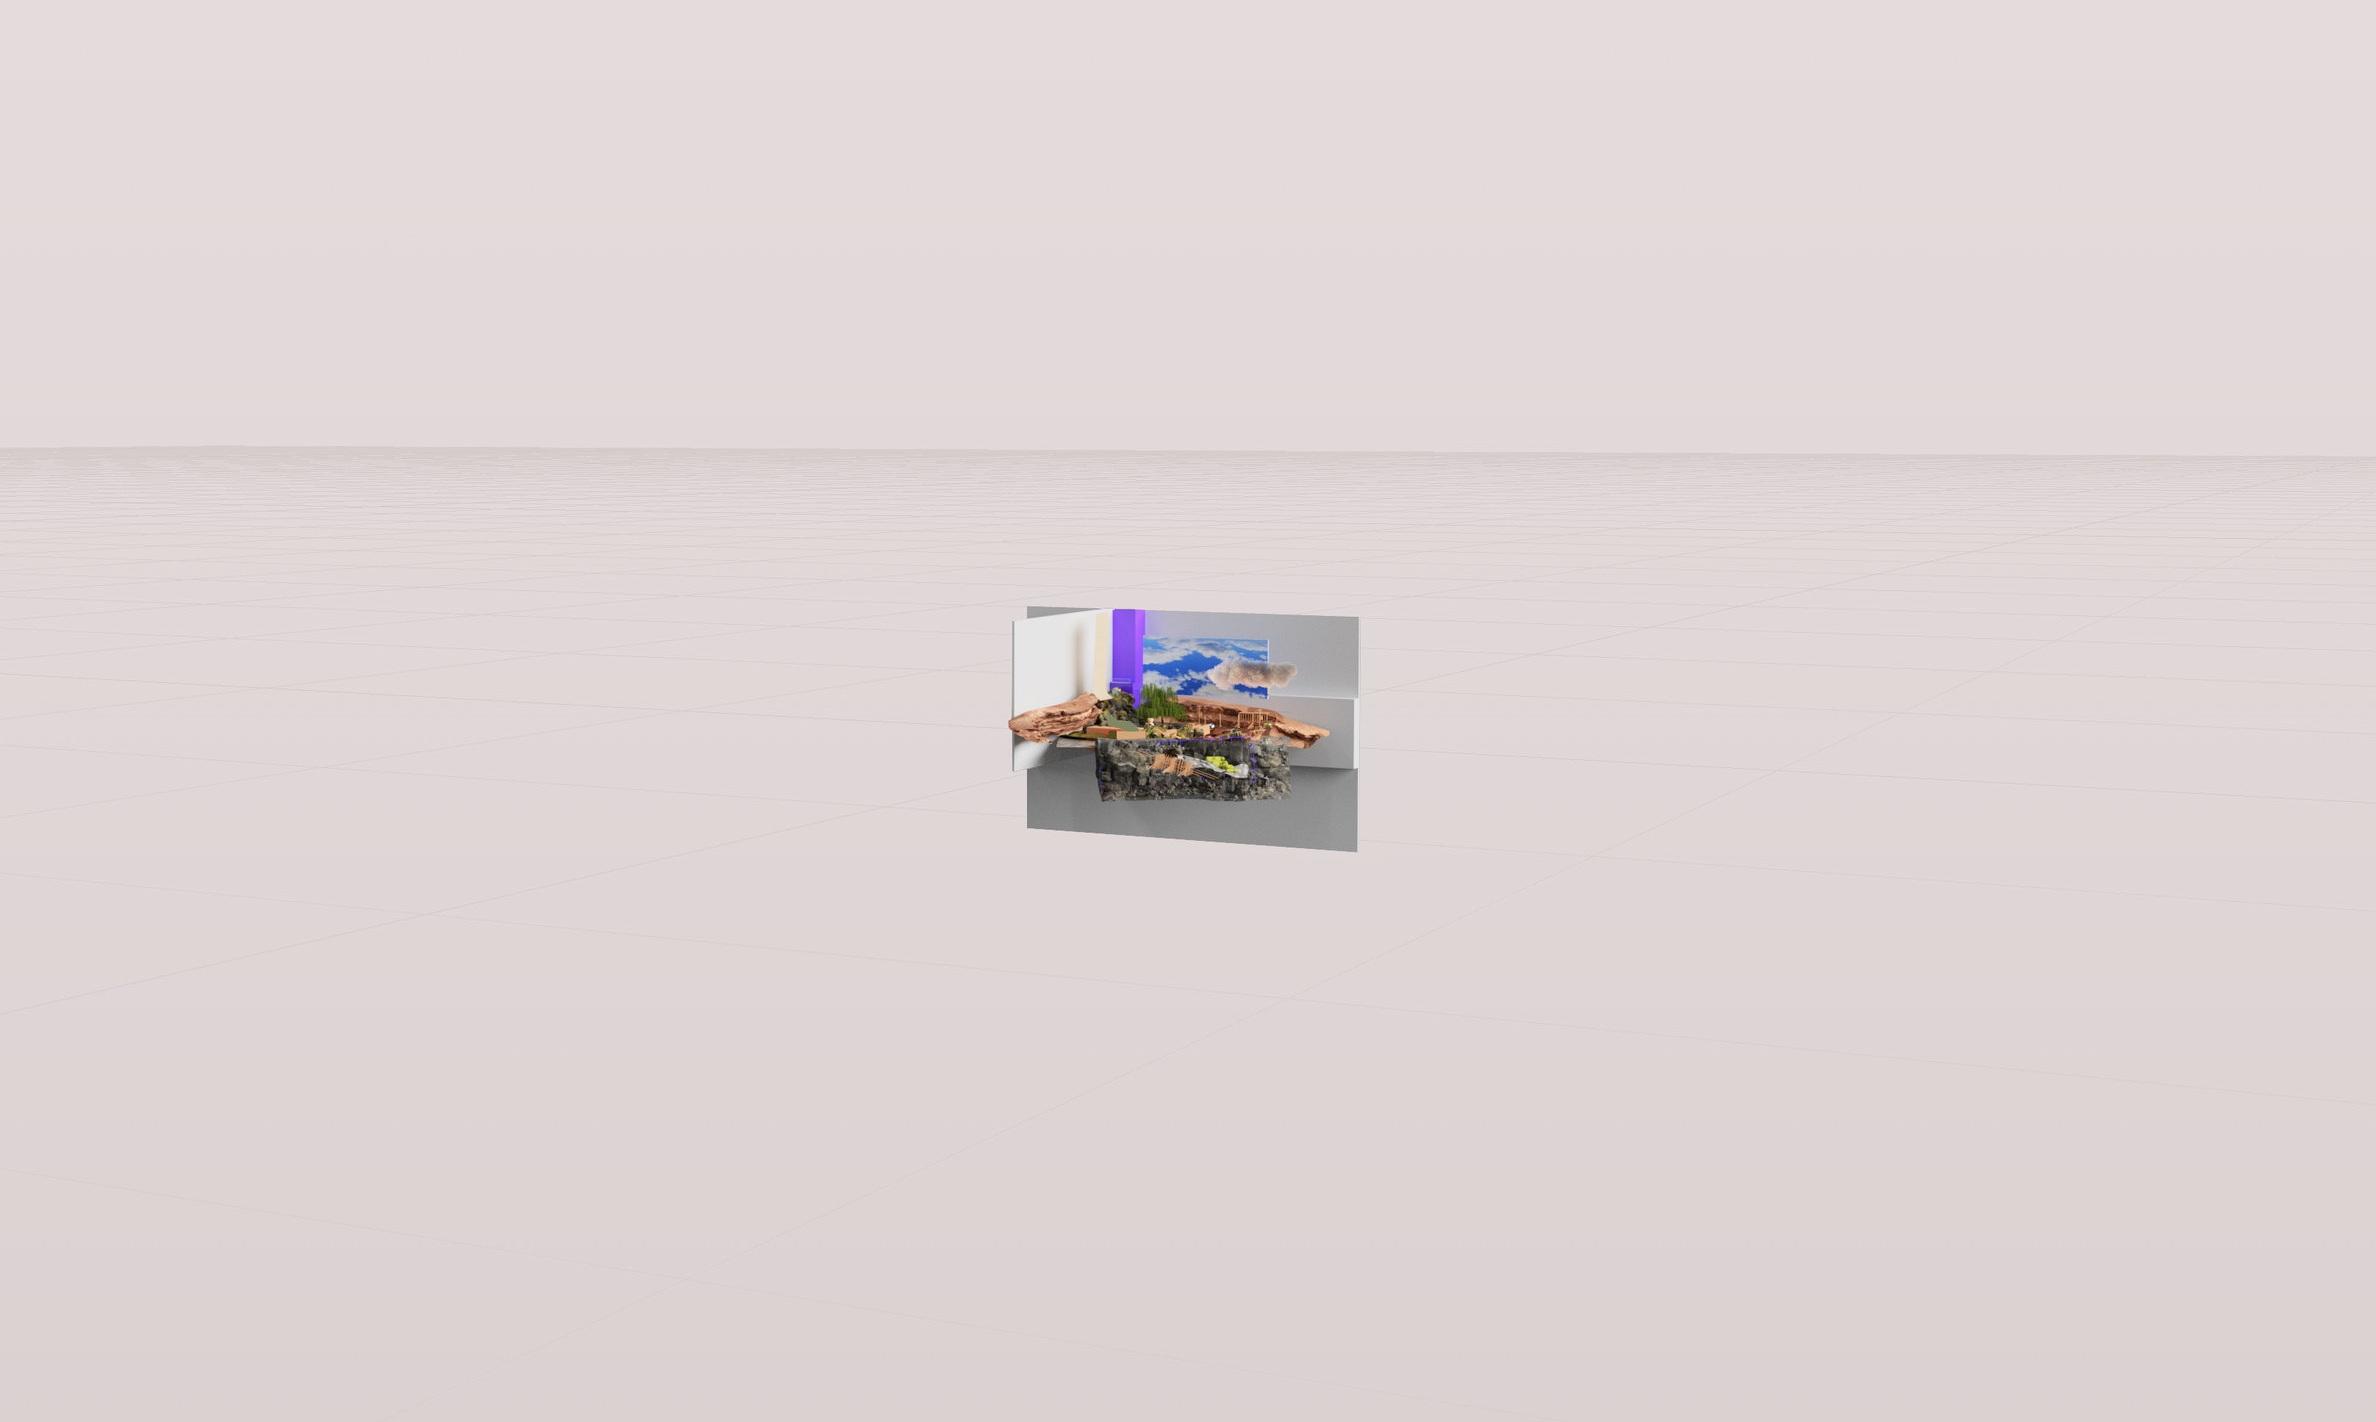 Set-R4-dom-22-Process-01-Camera_1_1_0001.jpg